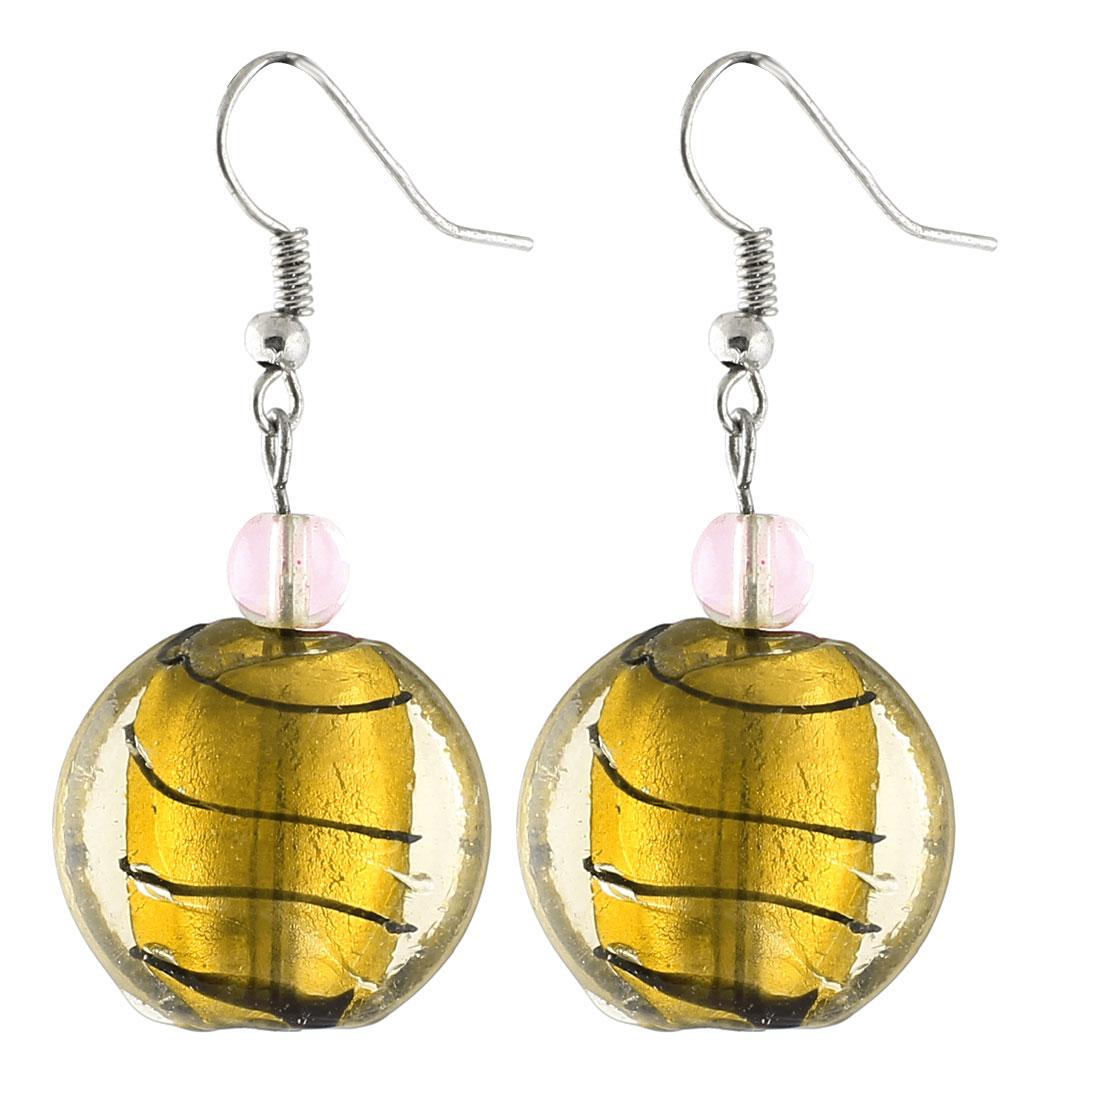 Ladies Plastic Lines Pattern Round Bead Dangling Pendant Earrings Gold Tone Pair